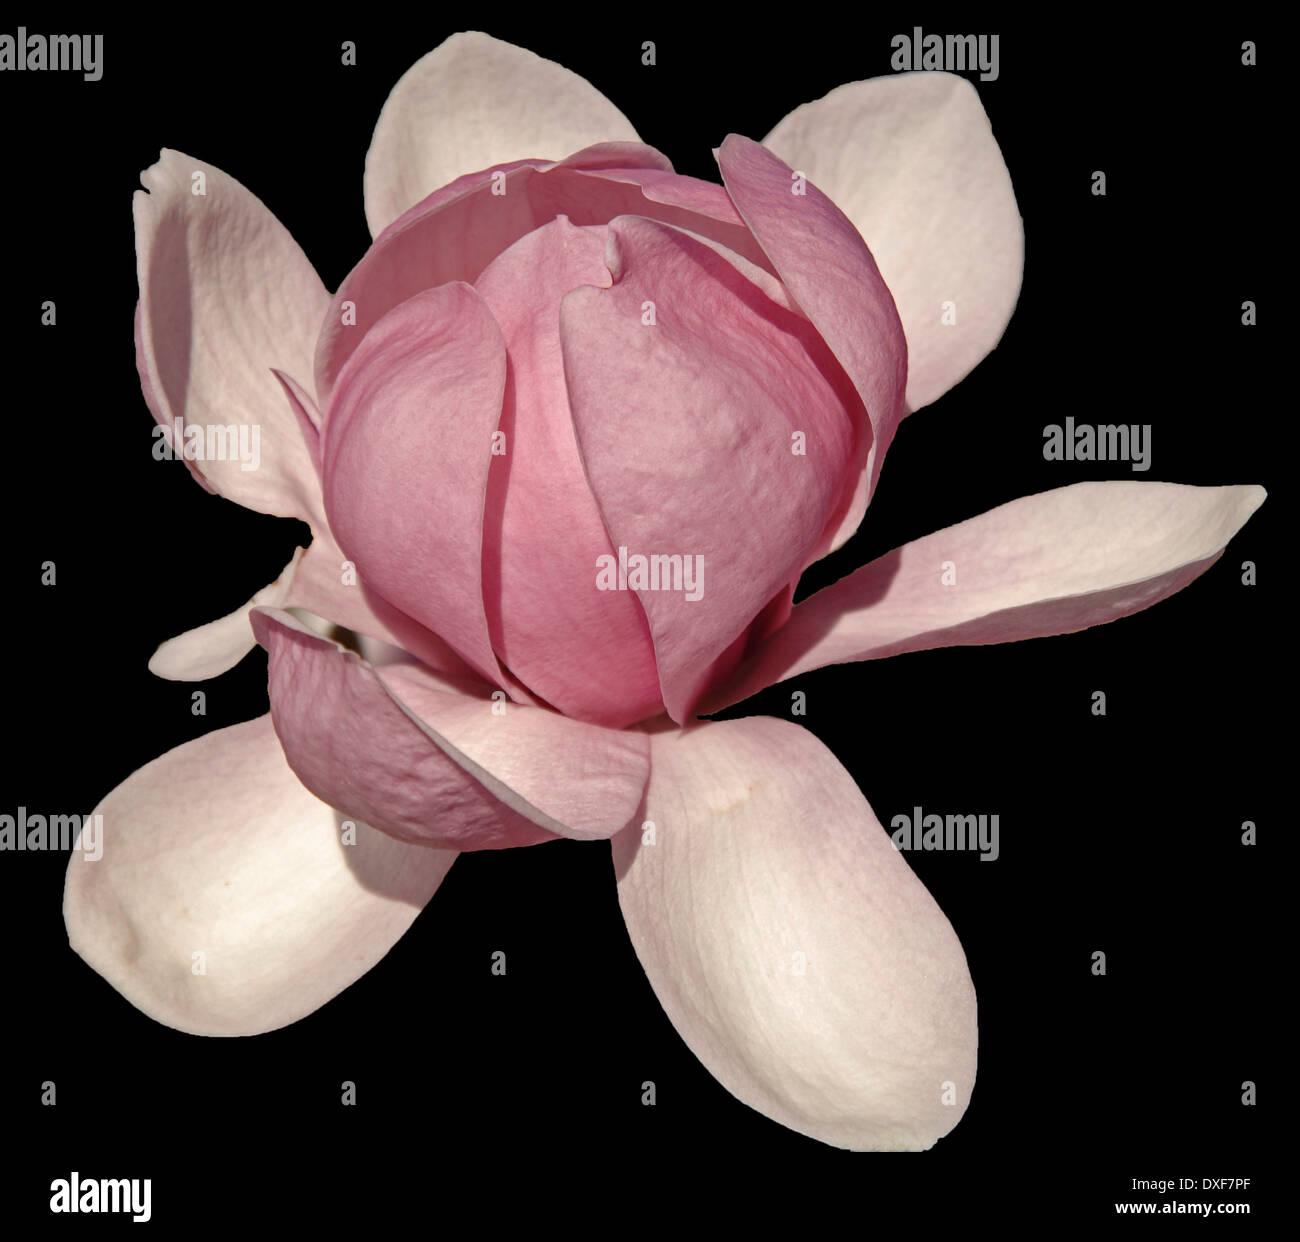 Magnolia Blossom on Black - Stock Image